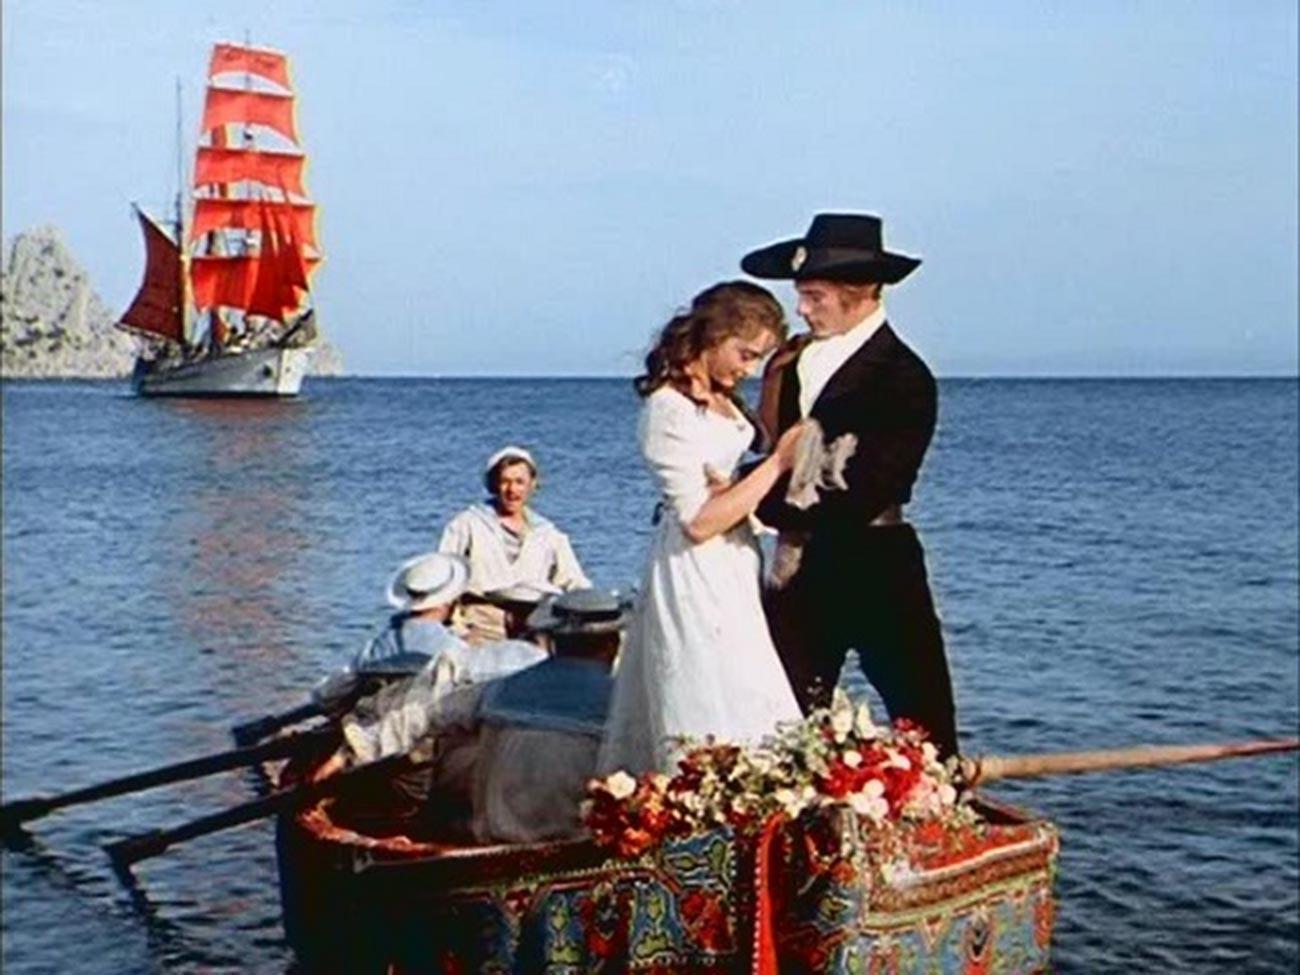 A still from 'Scarlet Sails' movie